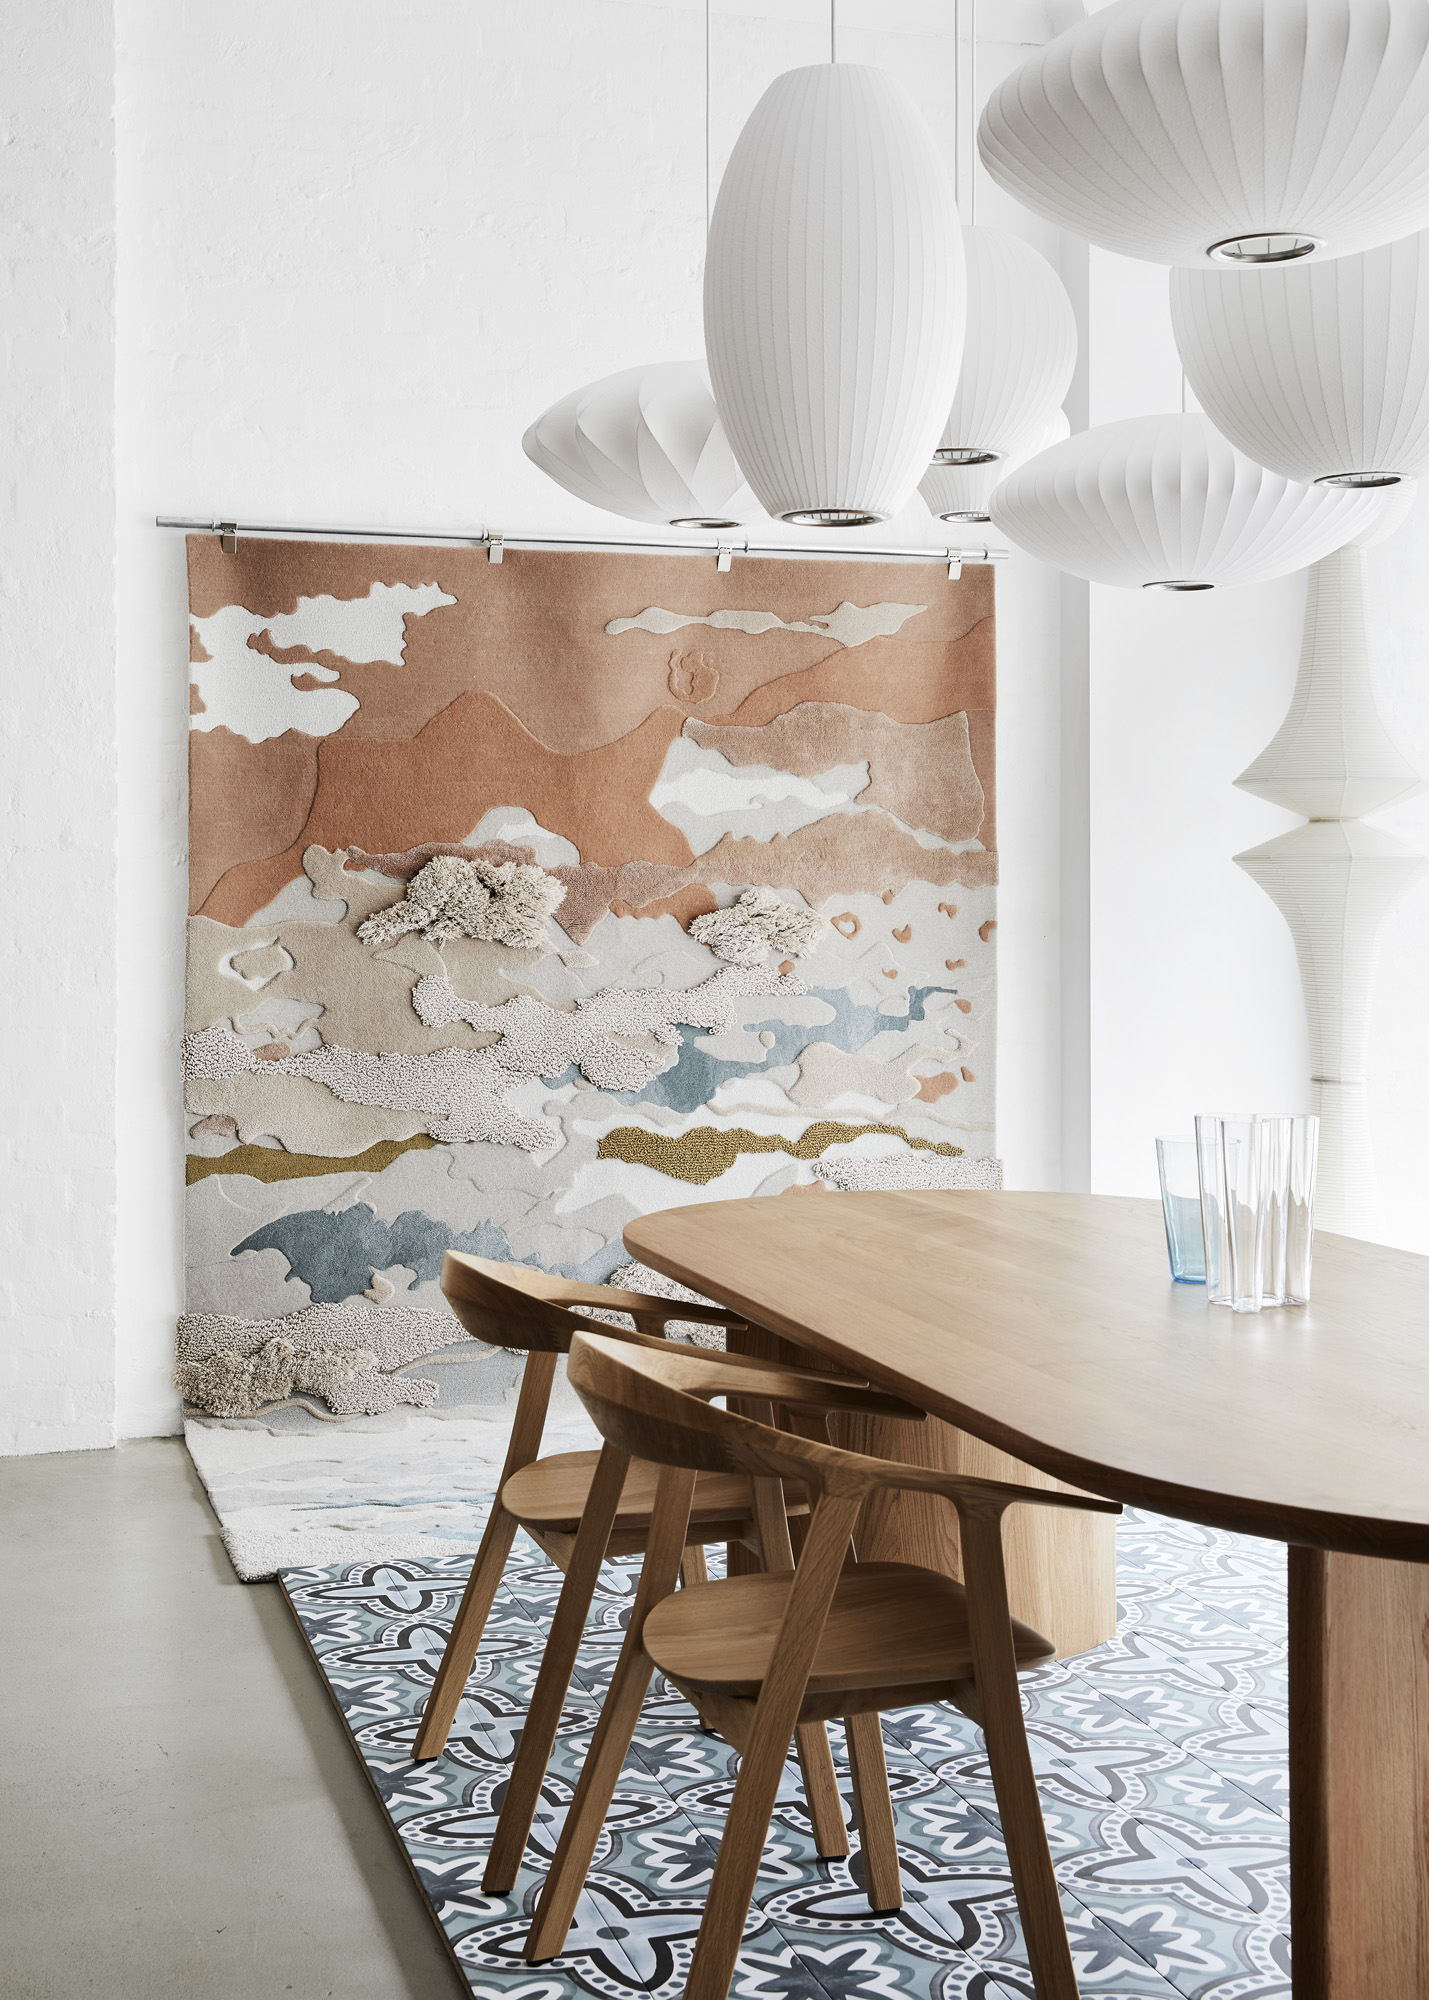 Materiality exhibition by TsarxLukexByzantine - Melbourne Design Week